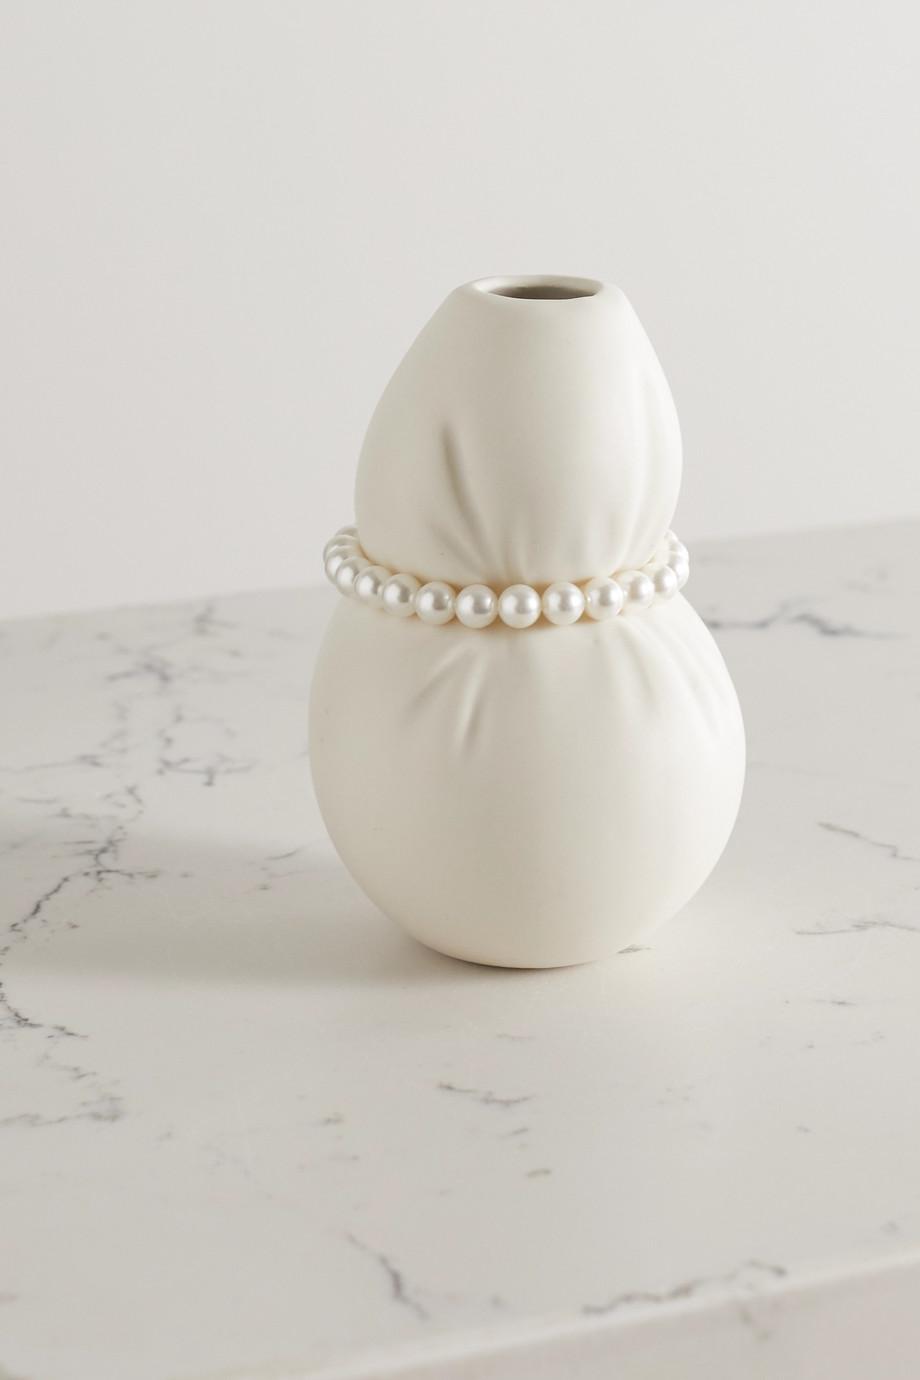 Completedworks Vase aus Keramik mit Kunstperlen